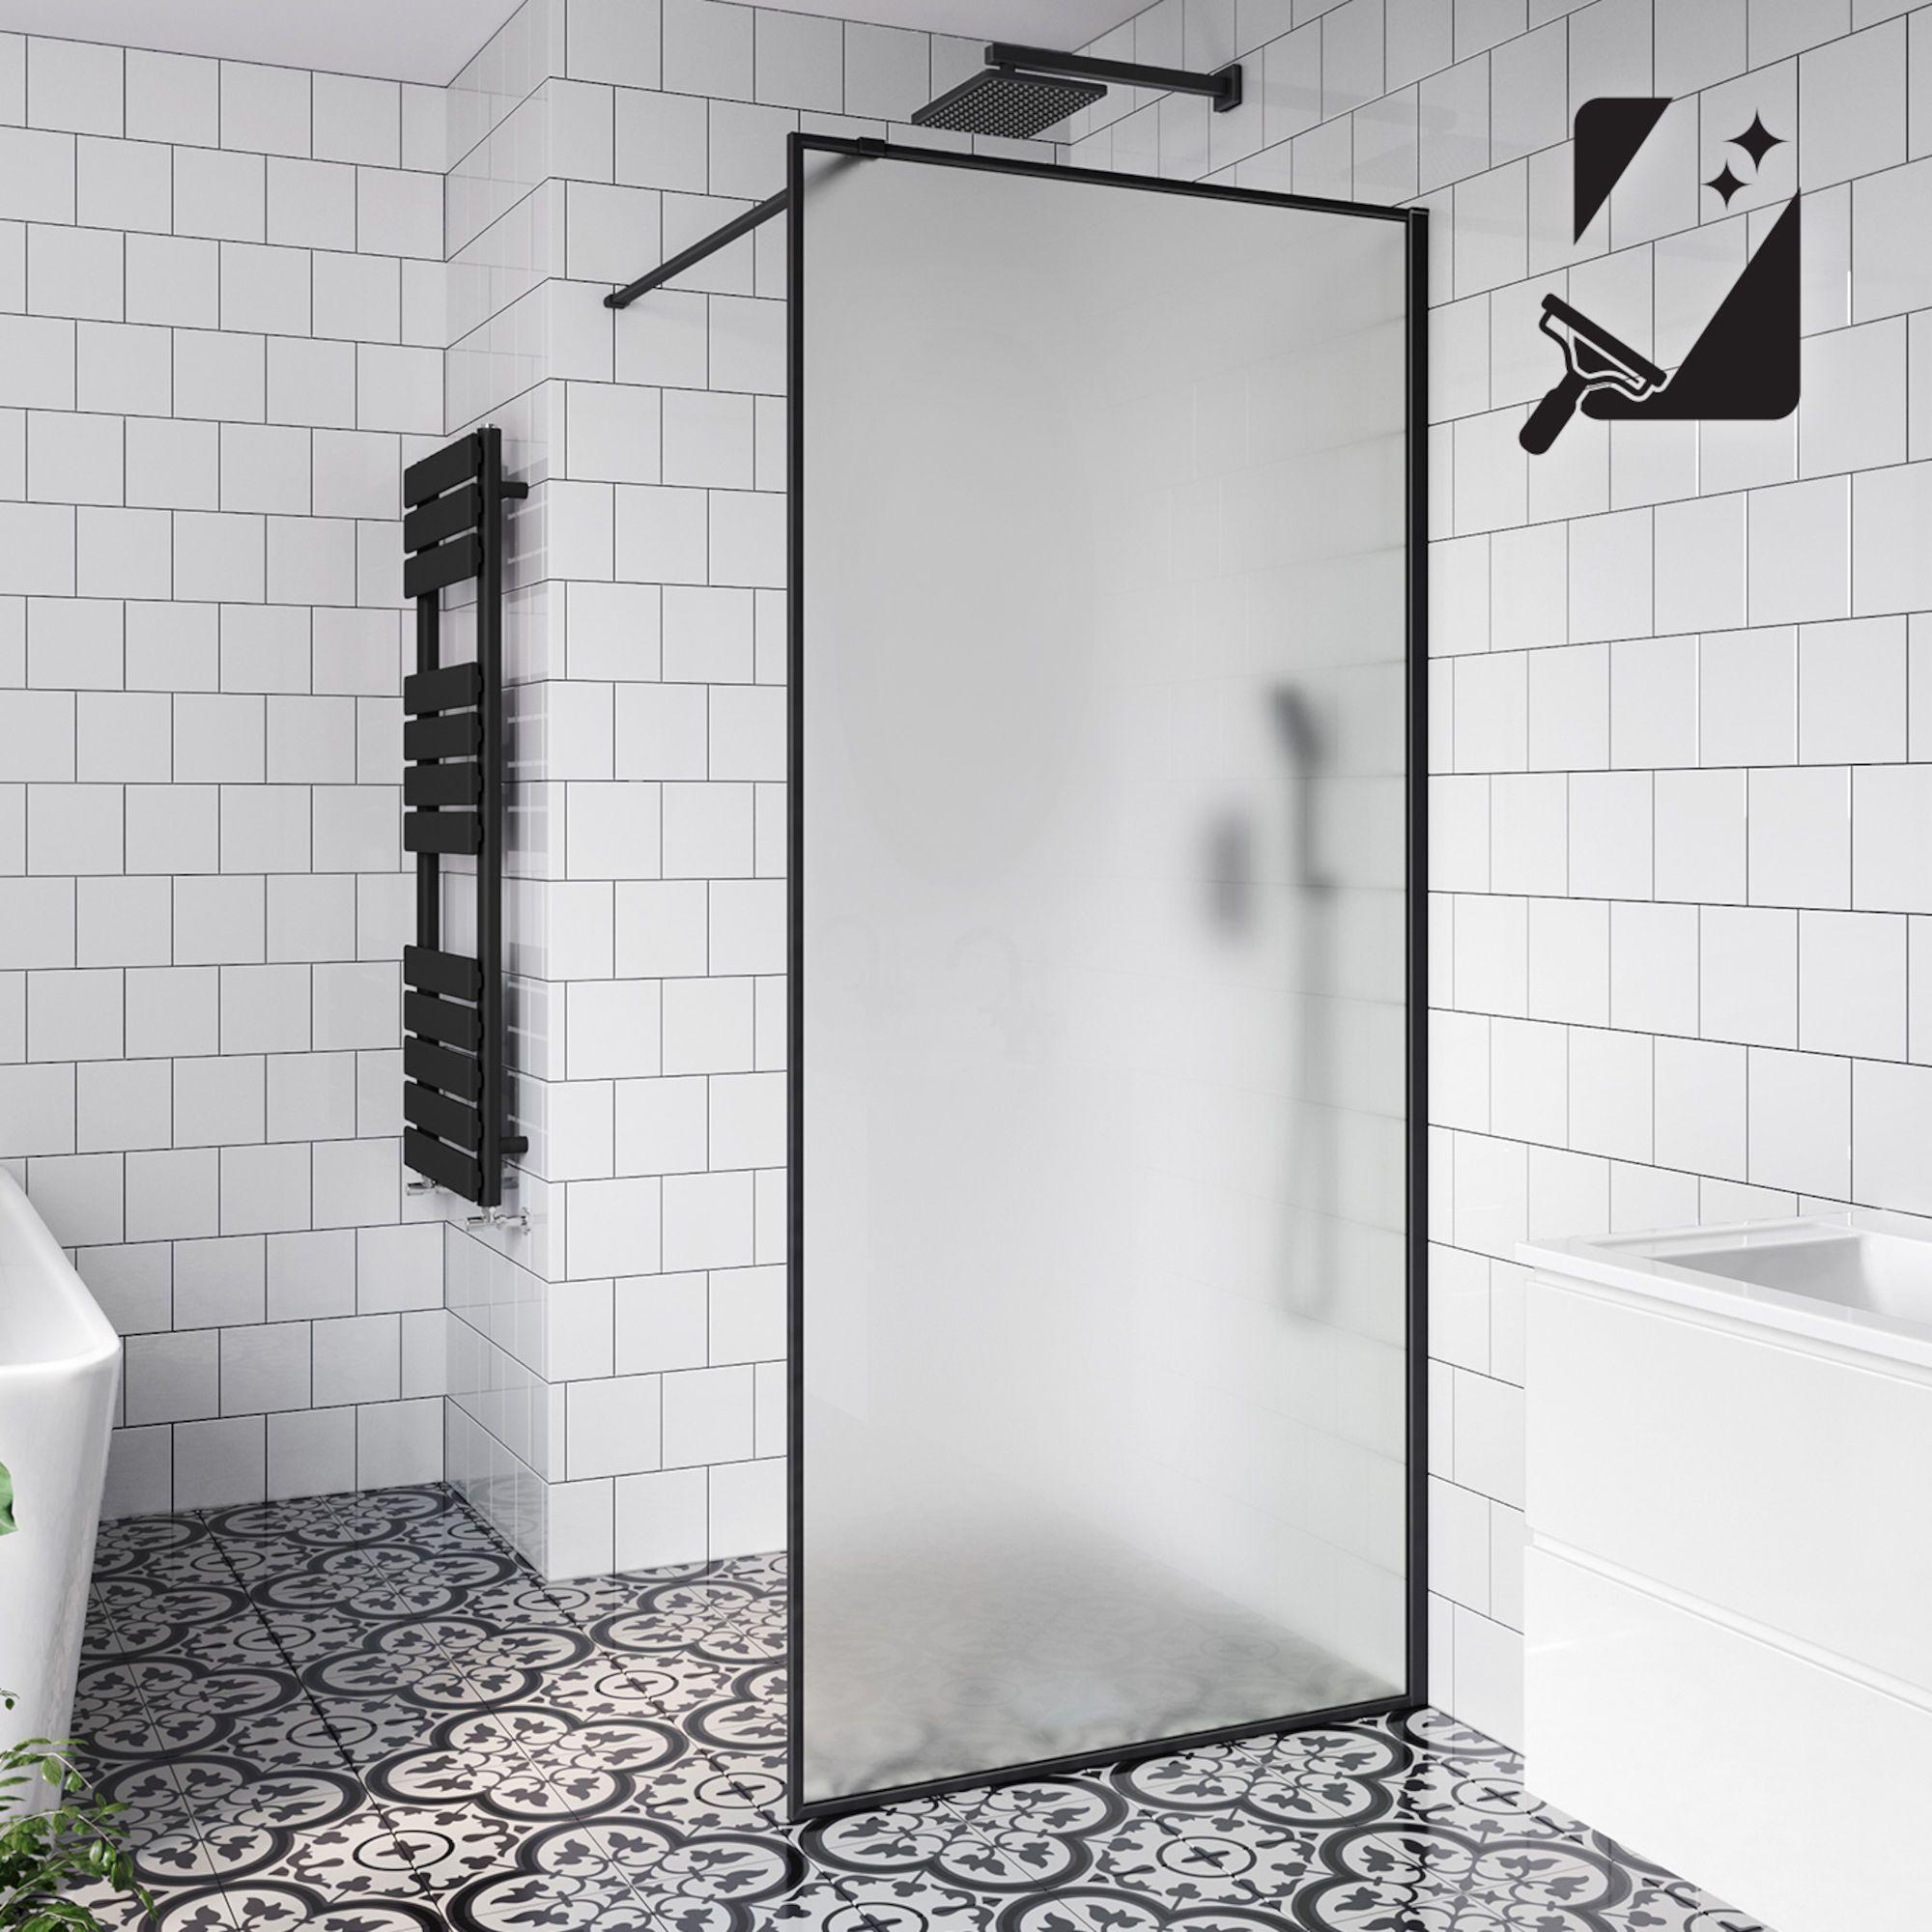 900mm 10mm Frosted Easyclean Glass Wetroom Panel Shower Screen Glass Shower Bathroom Shower Doors